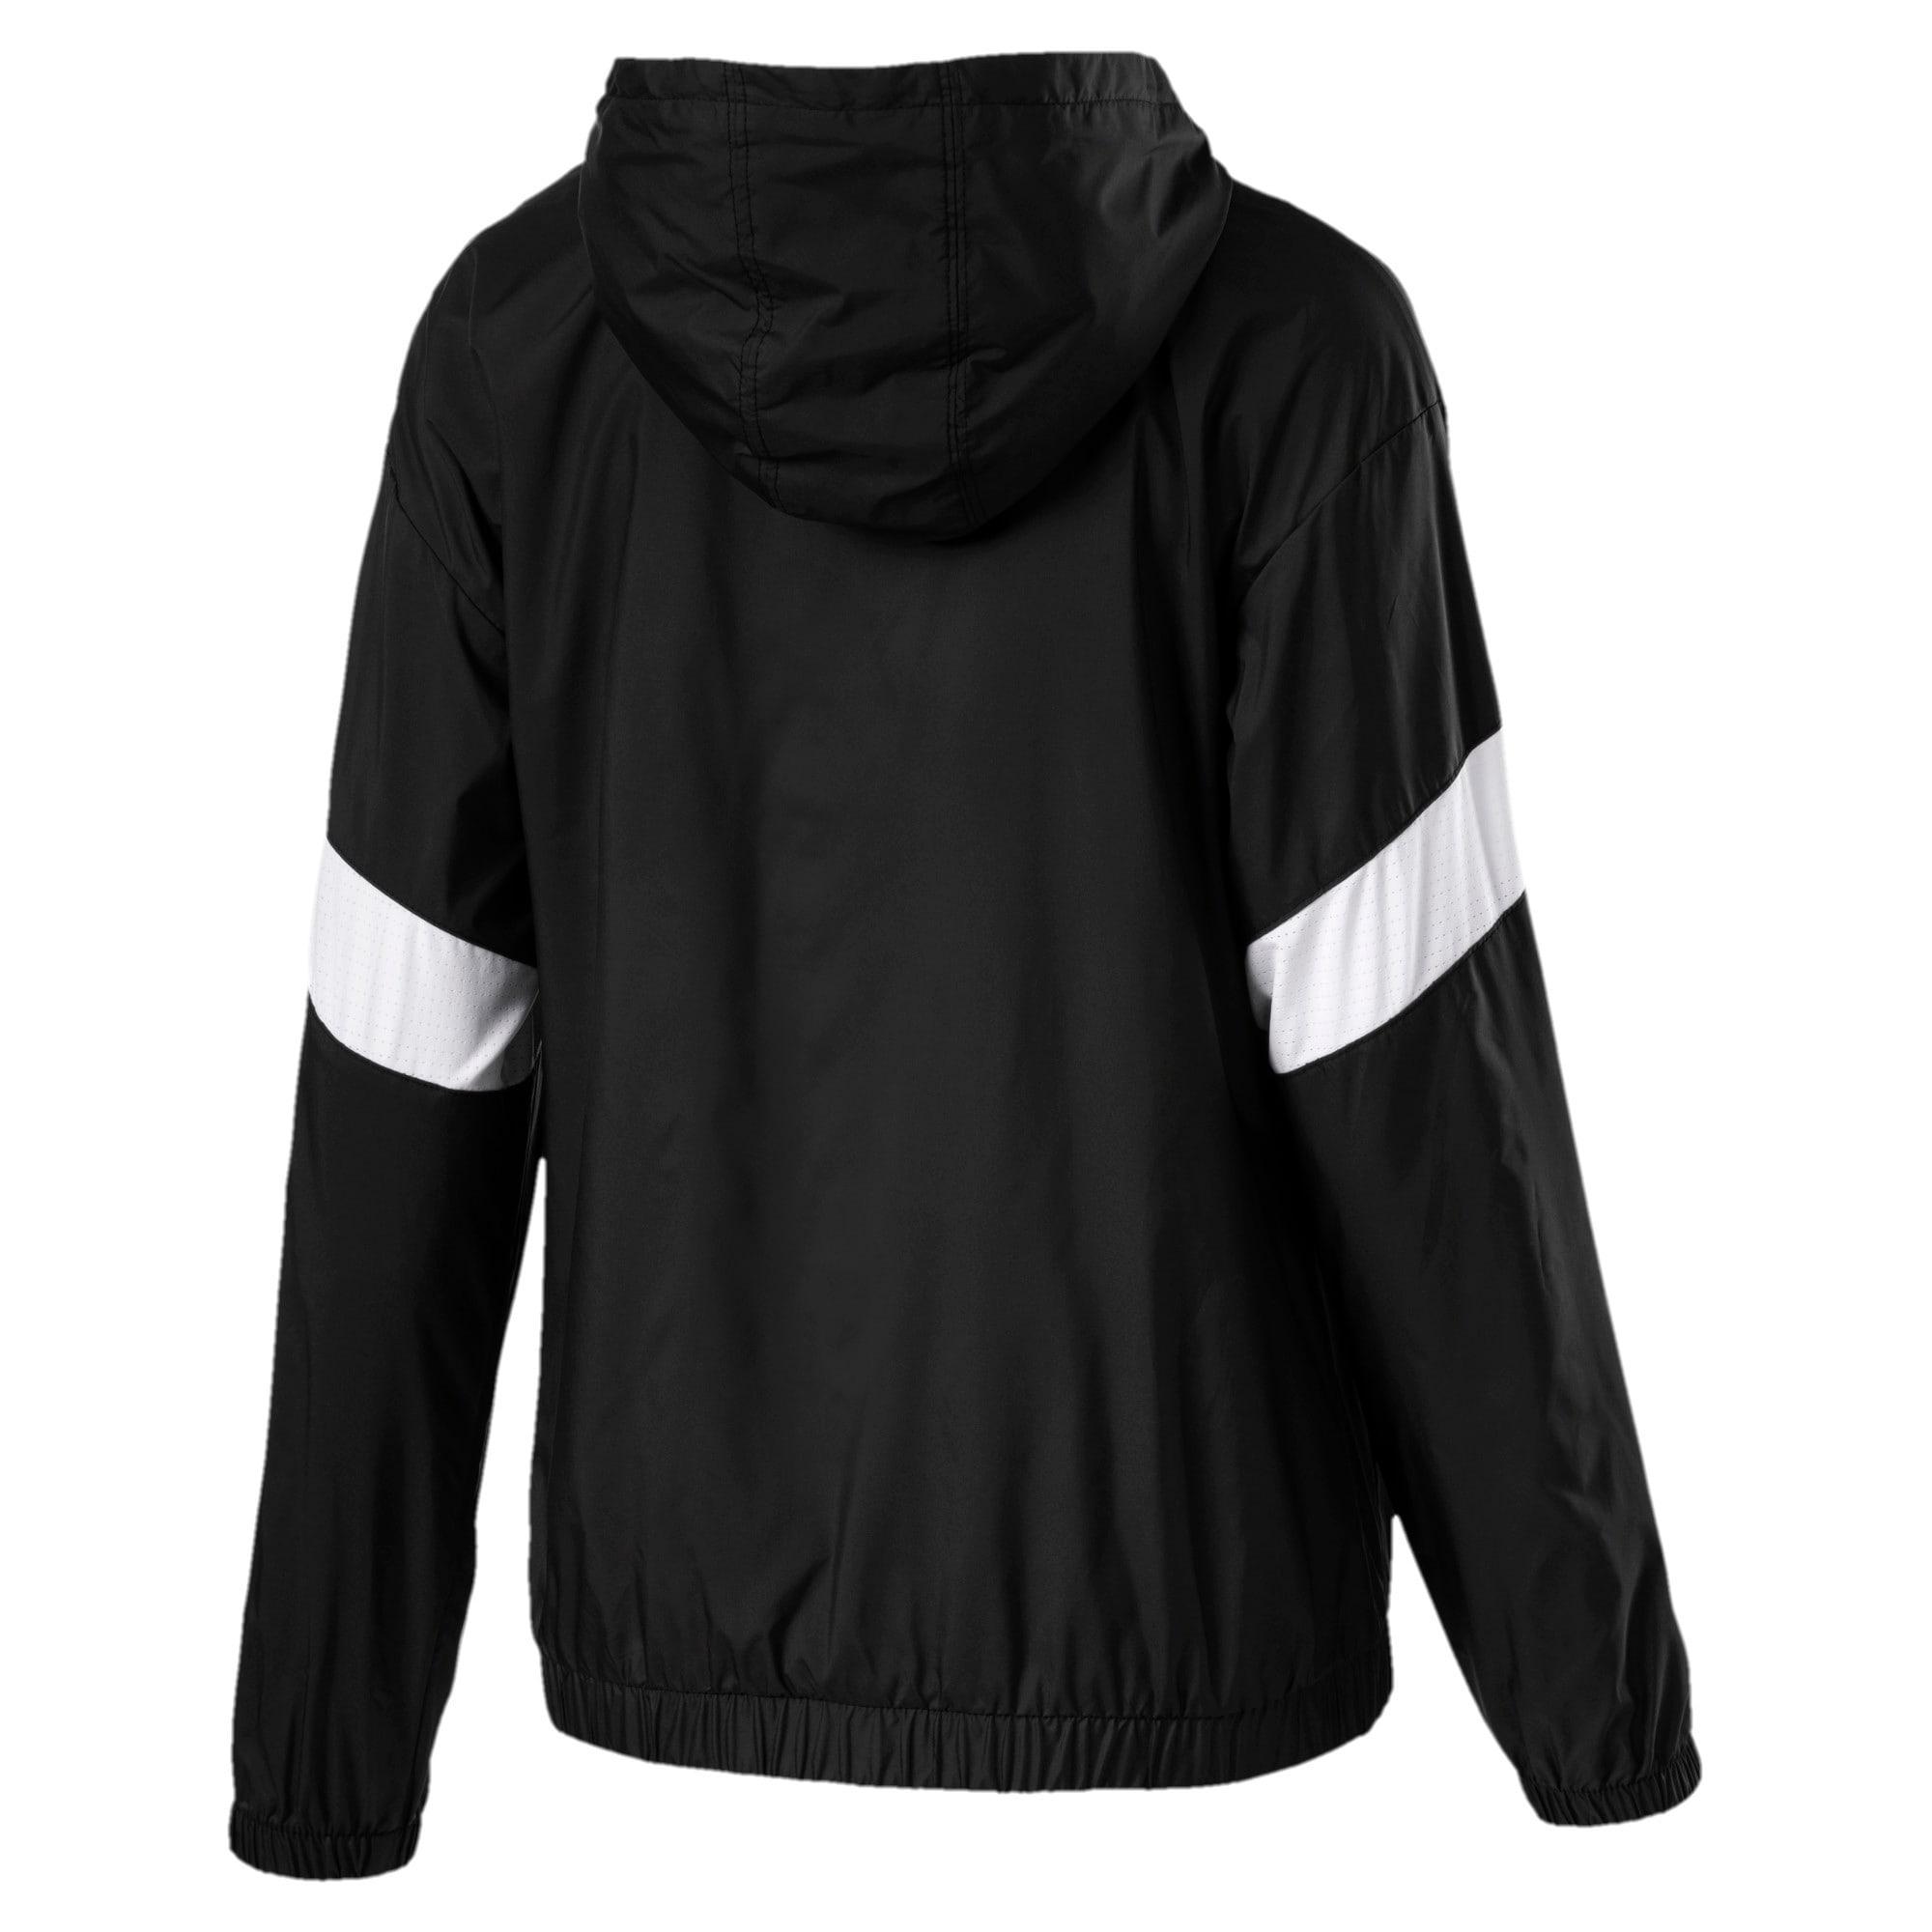 Thumbnail 4 of A.C.E Half Zip Hooded Women's Jacket, Puma Black-Puma White, medium-IND